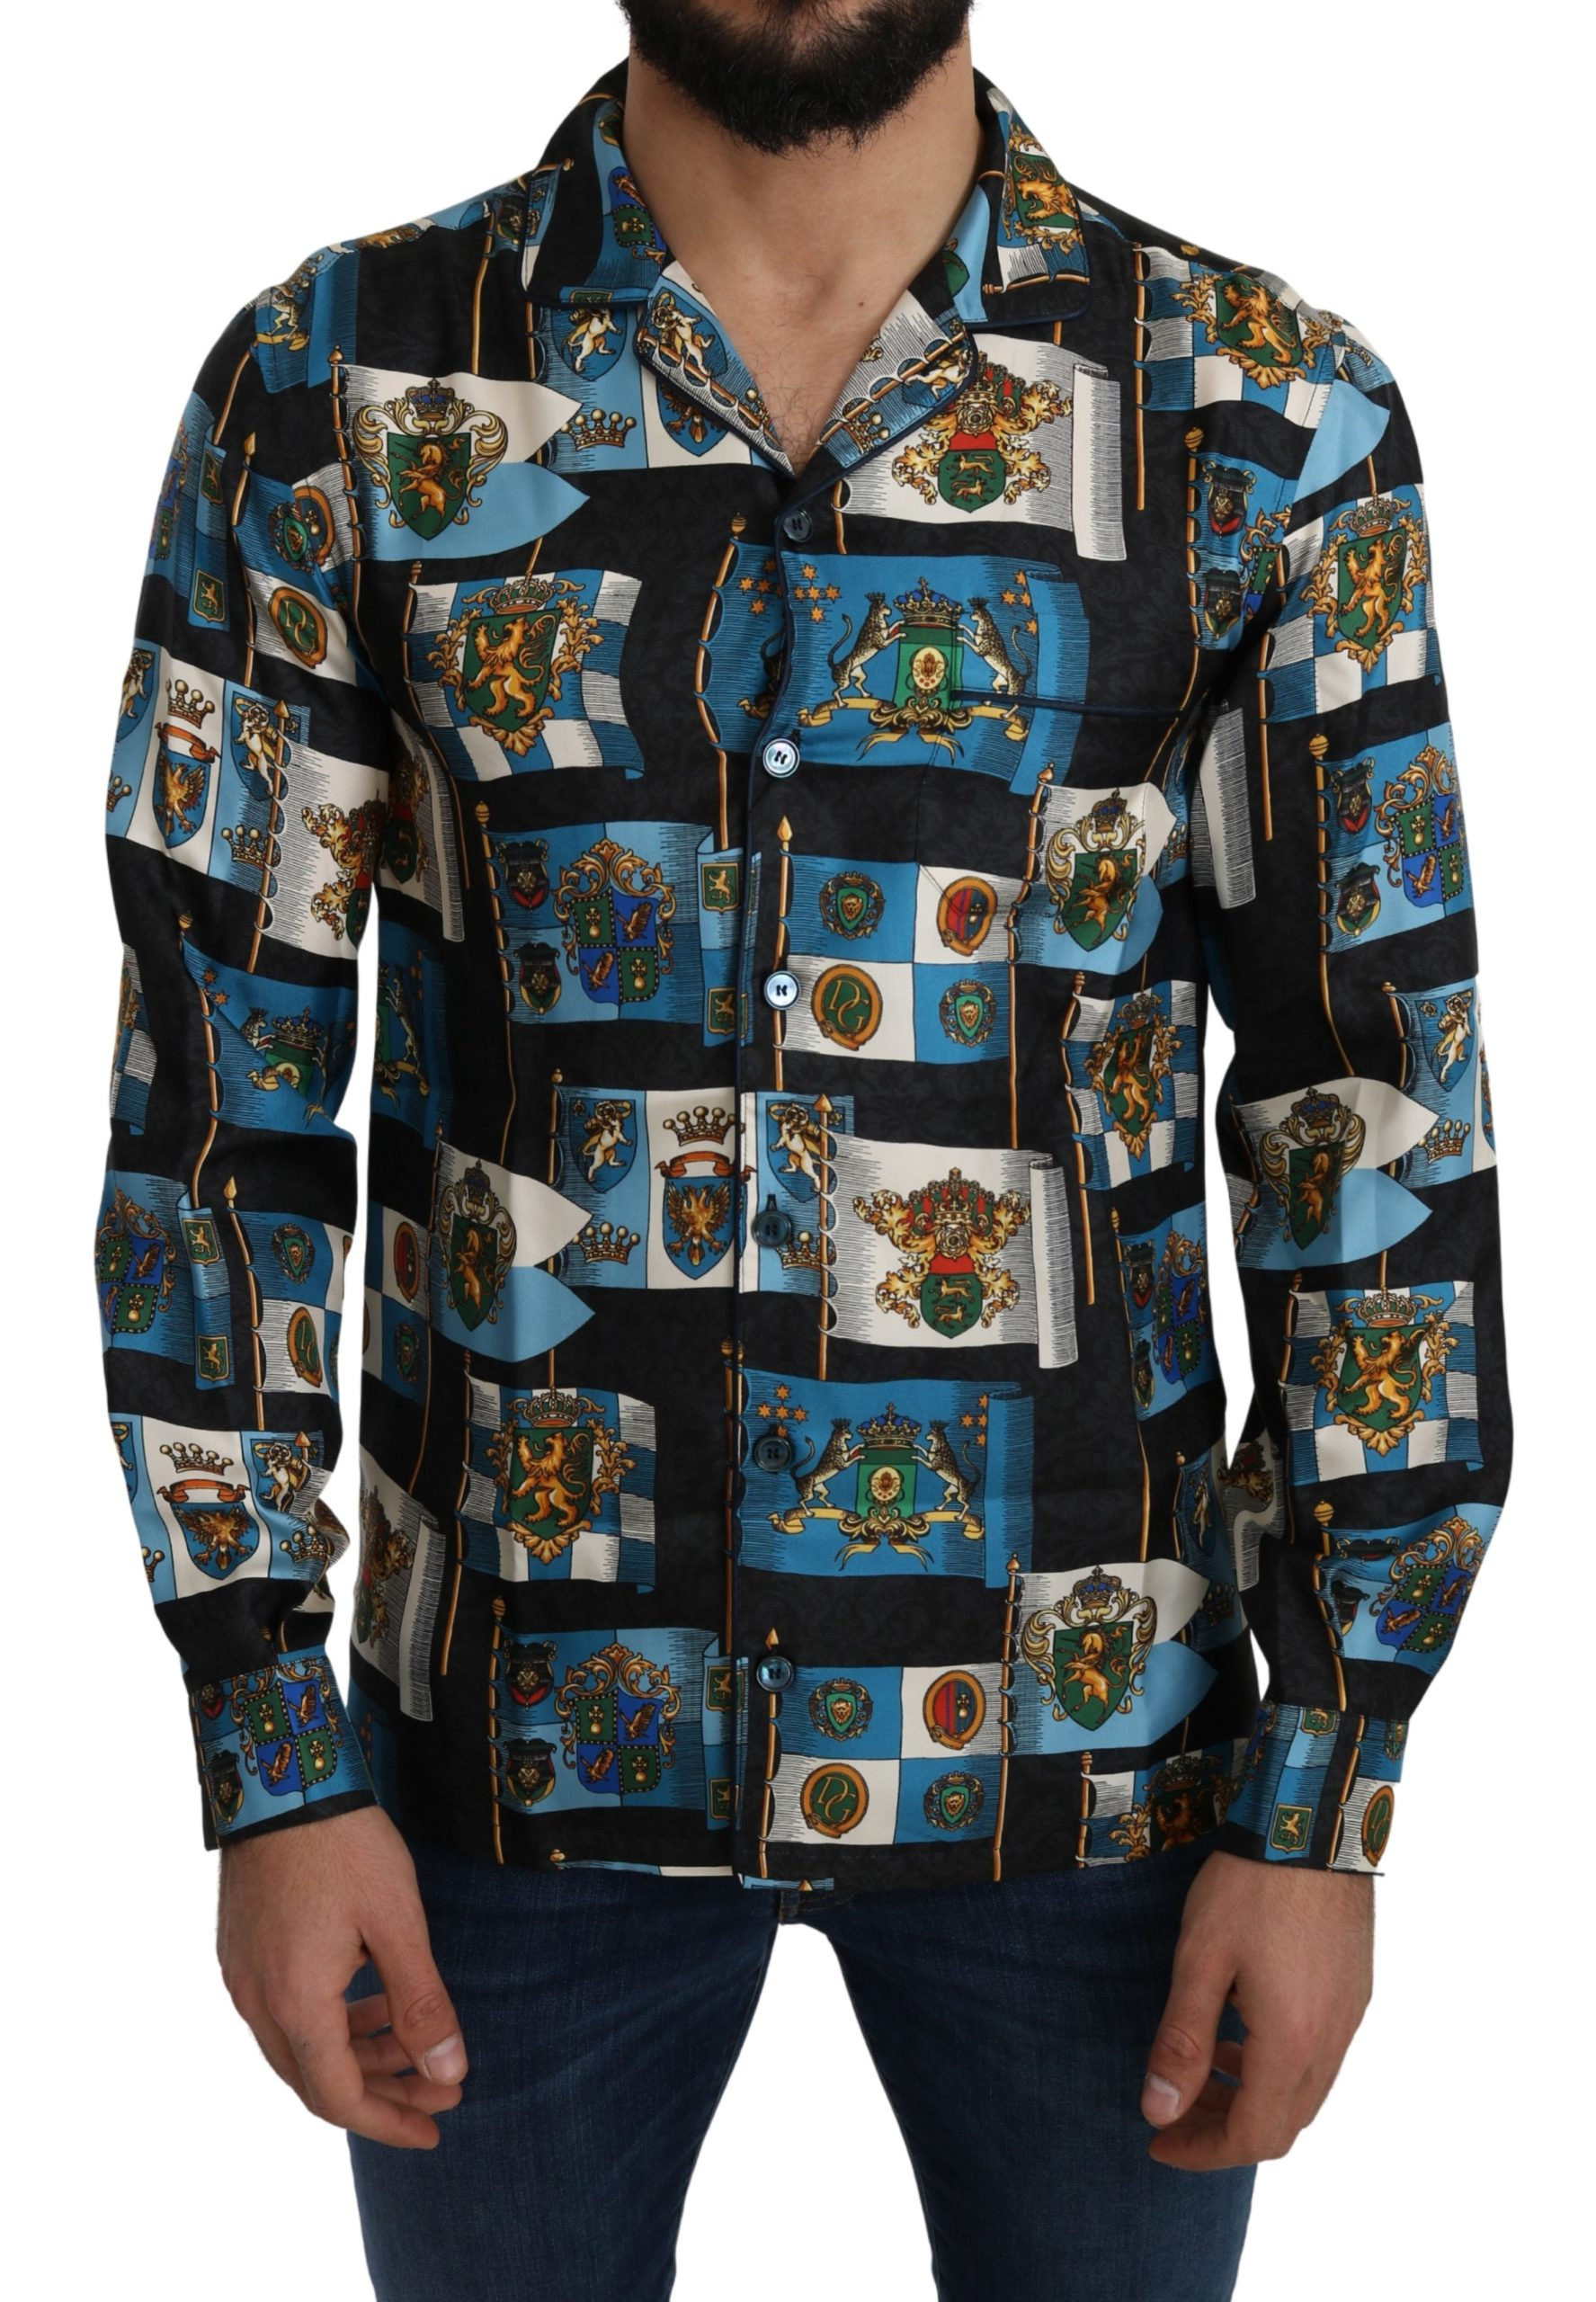 Dolce & Gabbana Men's Silk Coat of Arms Casual Shirt Blue TSH5209 - IT42 | XL